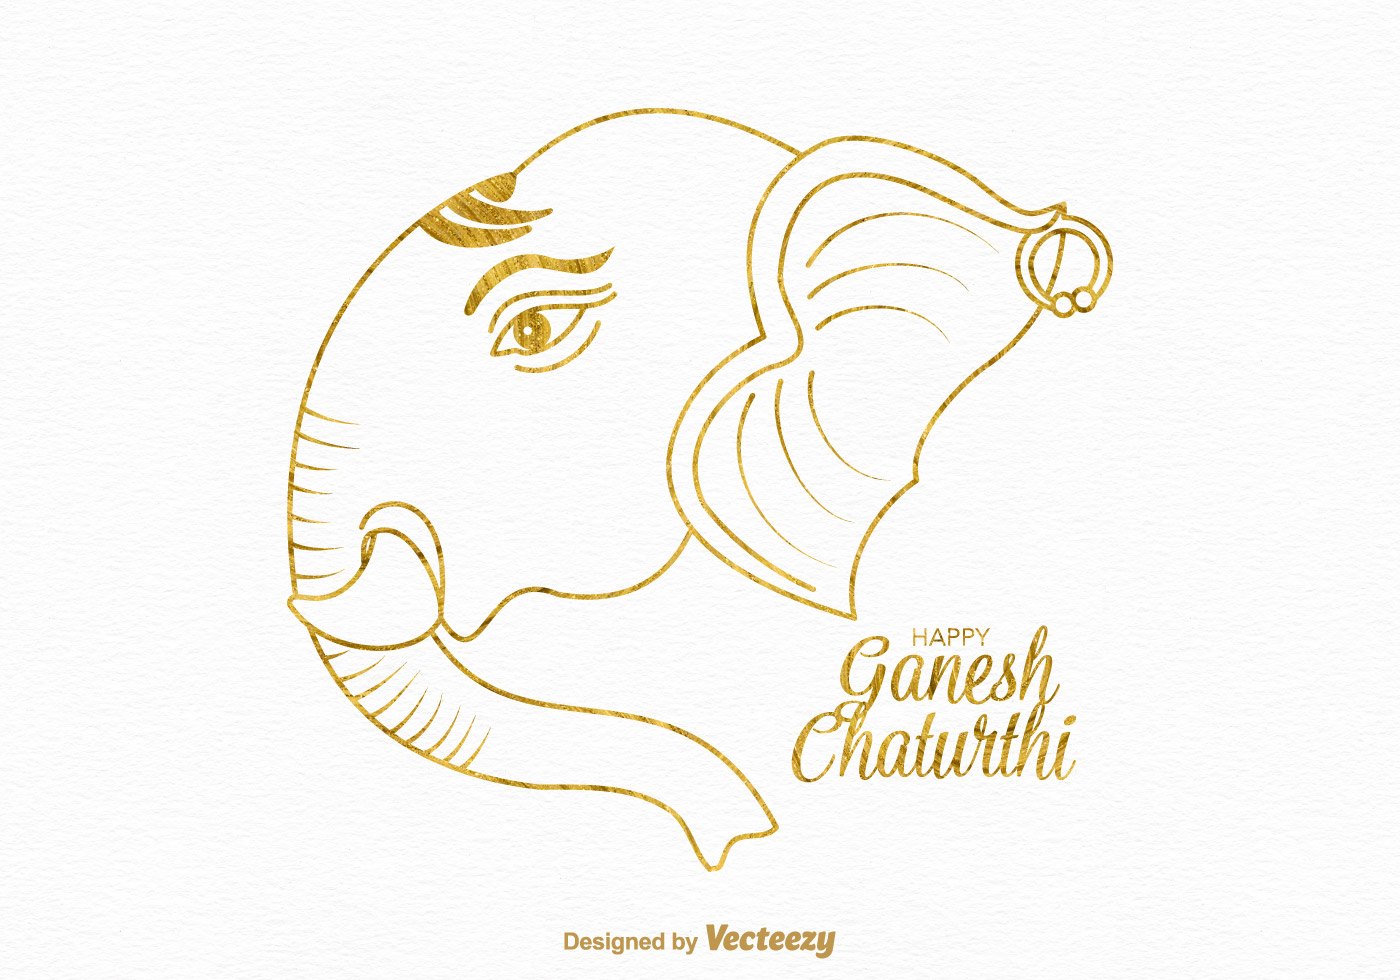 Free Happy Ganesh Chaturthi Vector Card Download Free Vector Art